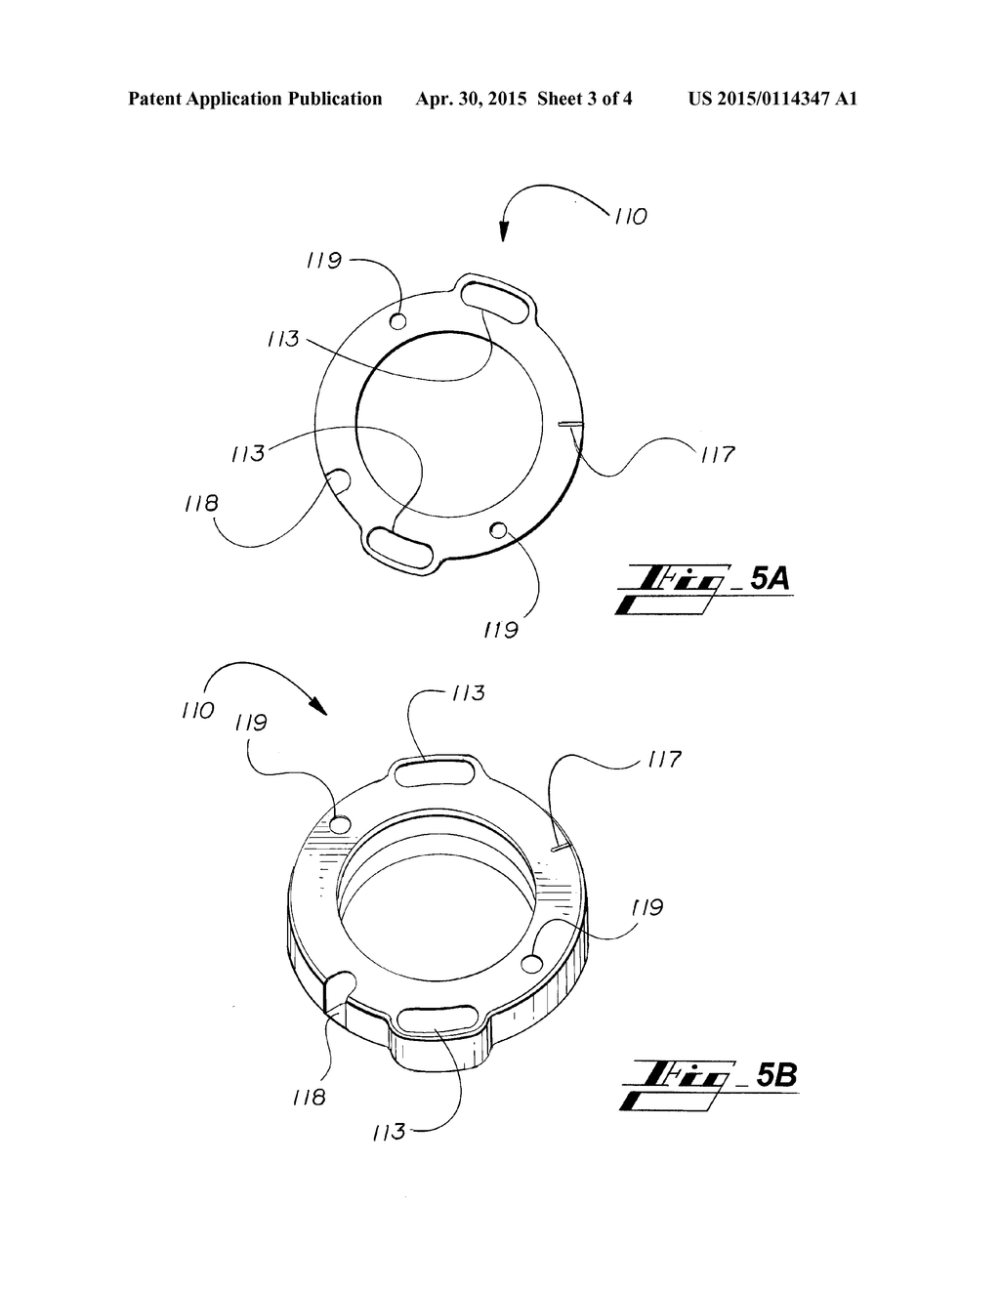 medium resolution of throttle position sensor tps clocker diagram schematic and image 04